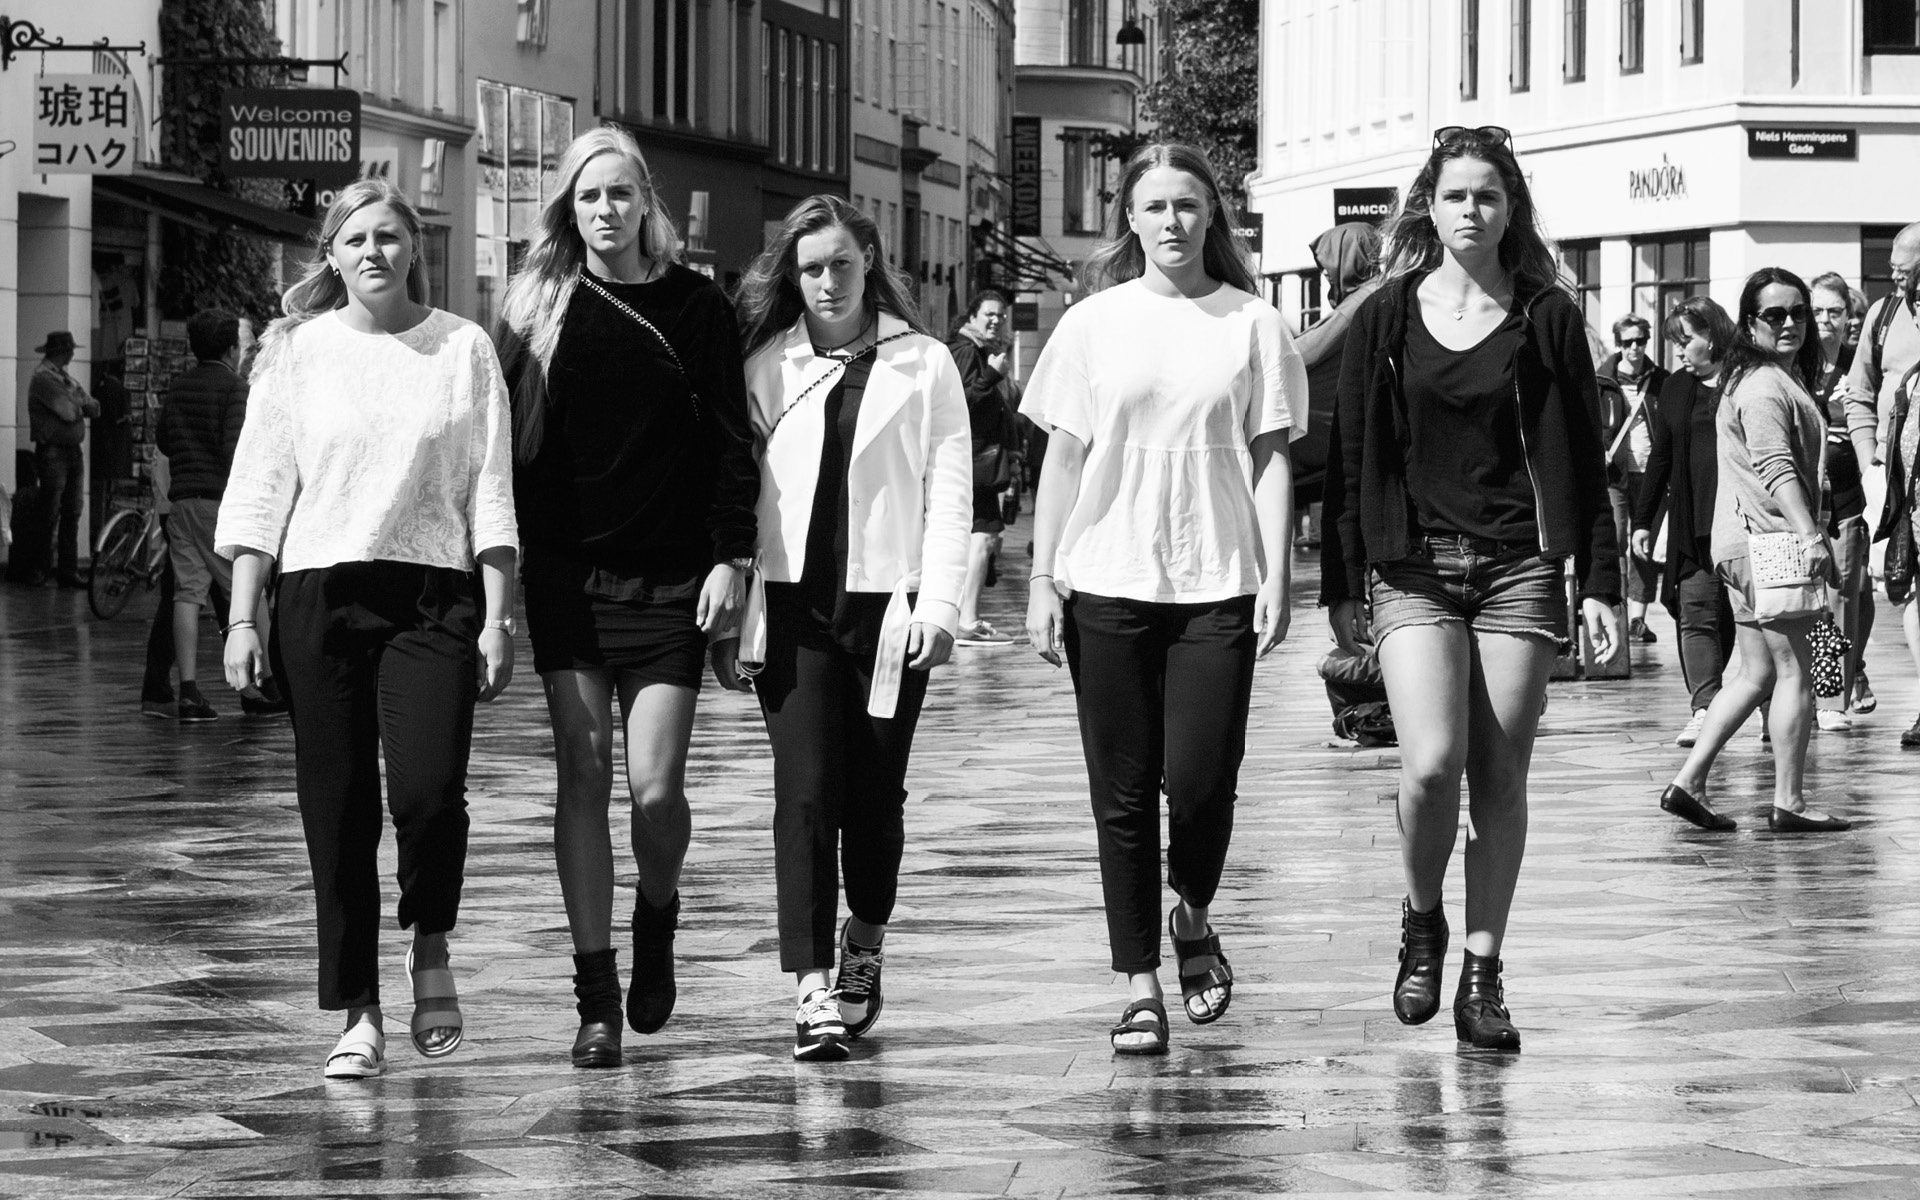 escort vestsjælland sex massage i kbh